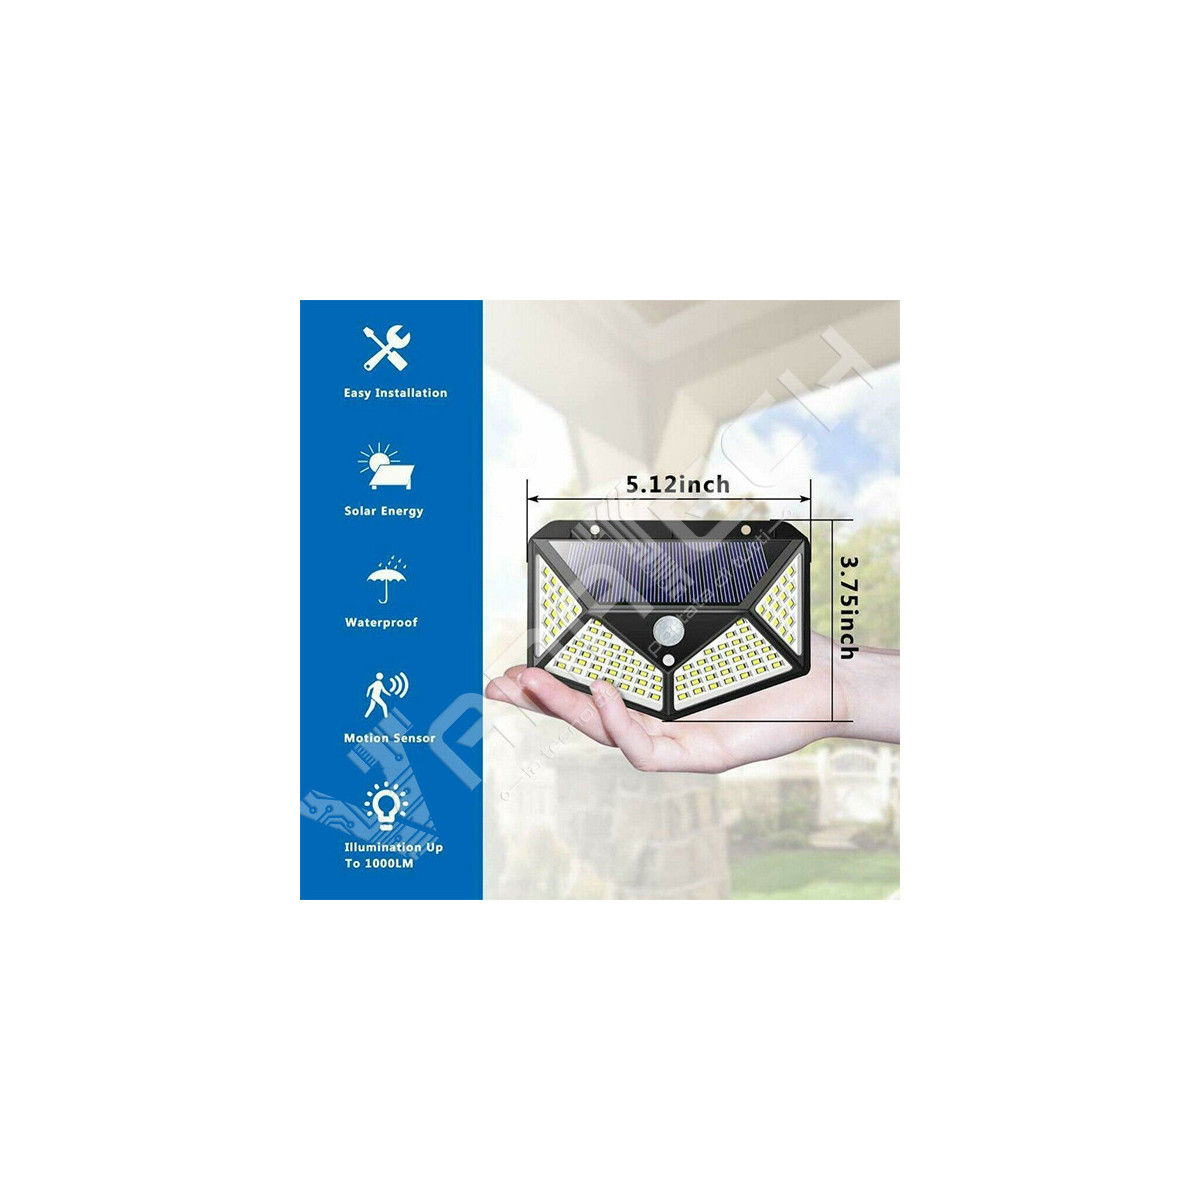 PC 027 PC DESKTOP COMPLETO INTEL I5-7400 4GB RAM 1TB 1000GB HARD DISK